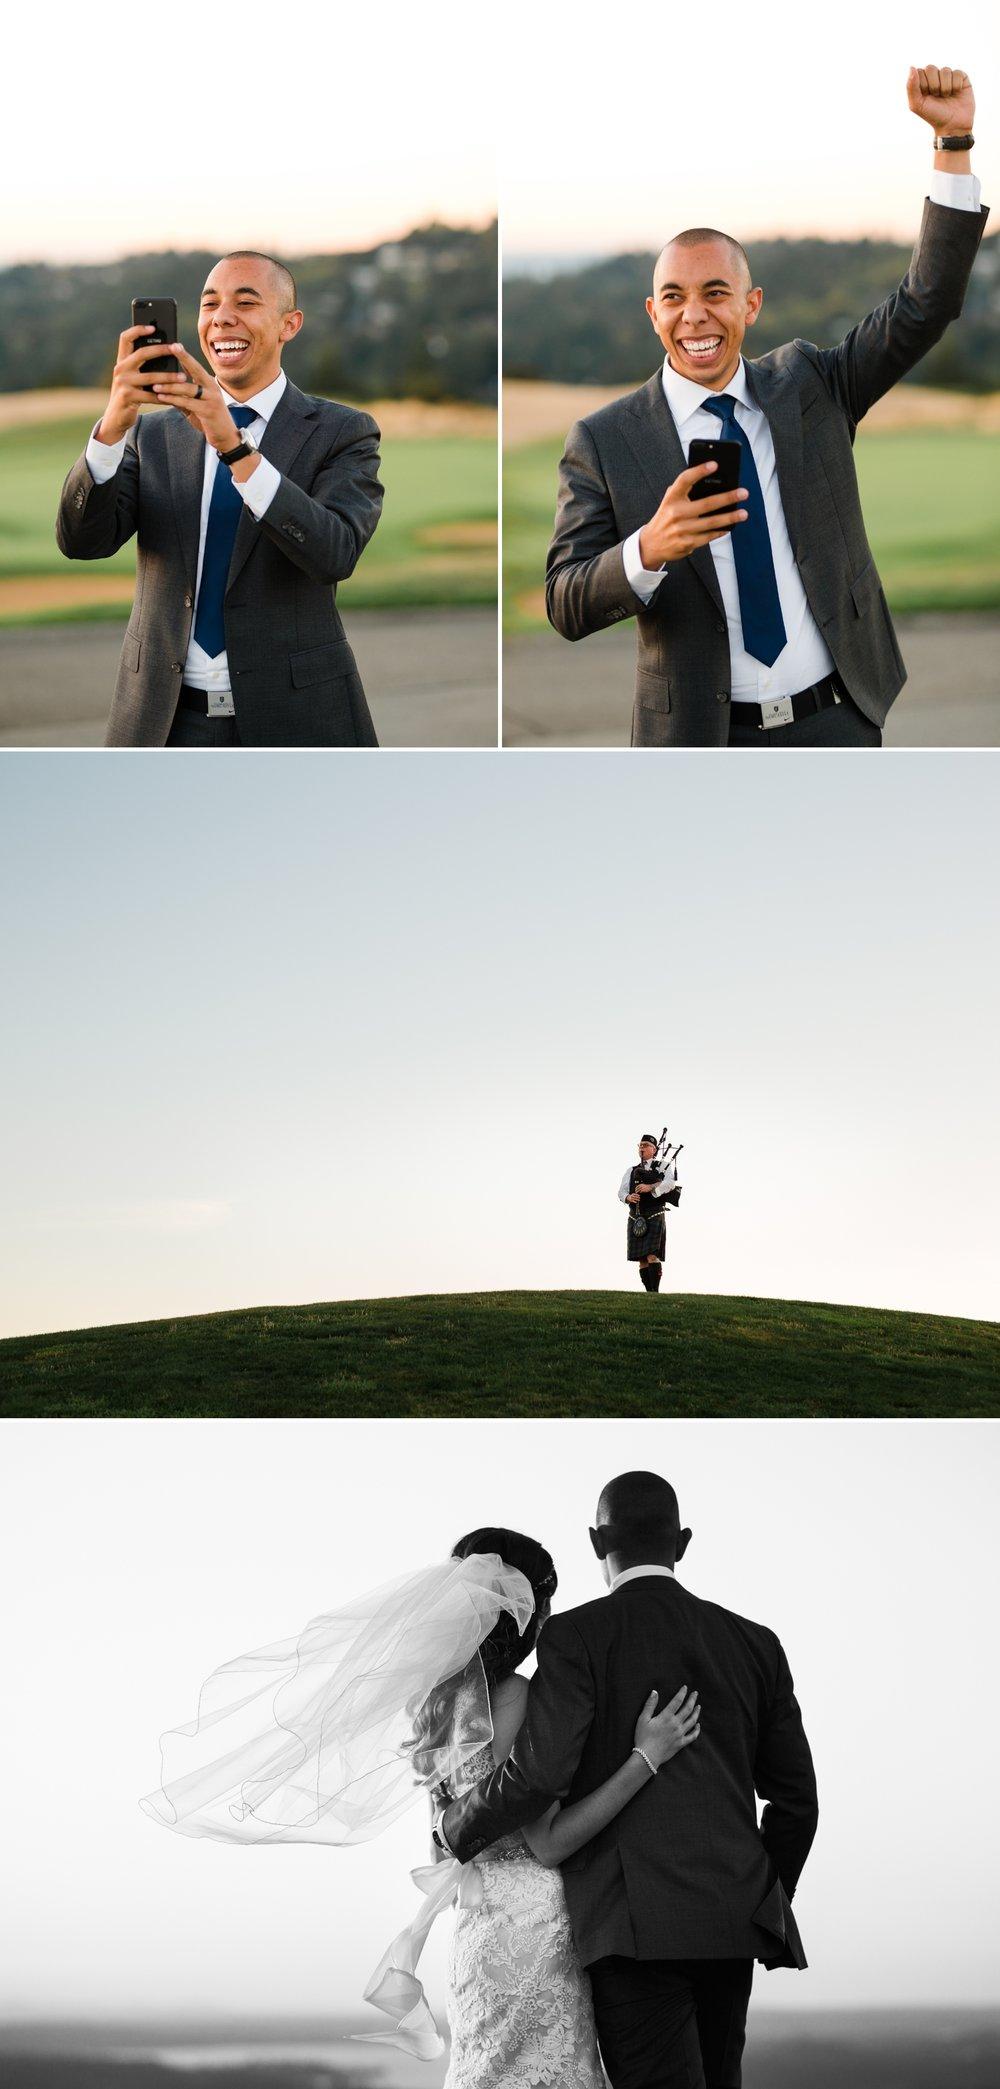 23-newcastle-golf-club-sunset-portraits.jpg